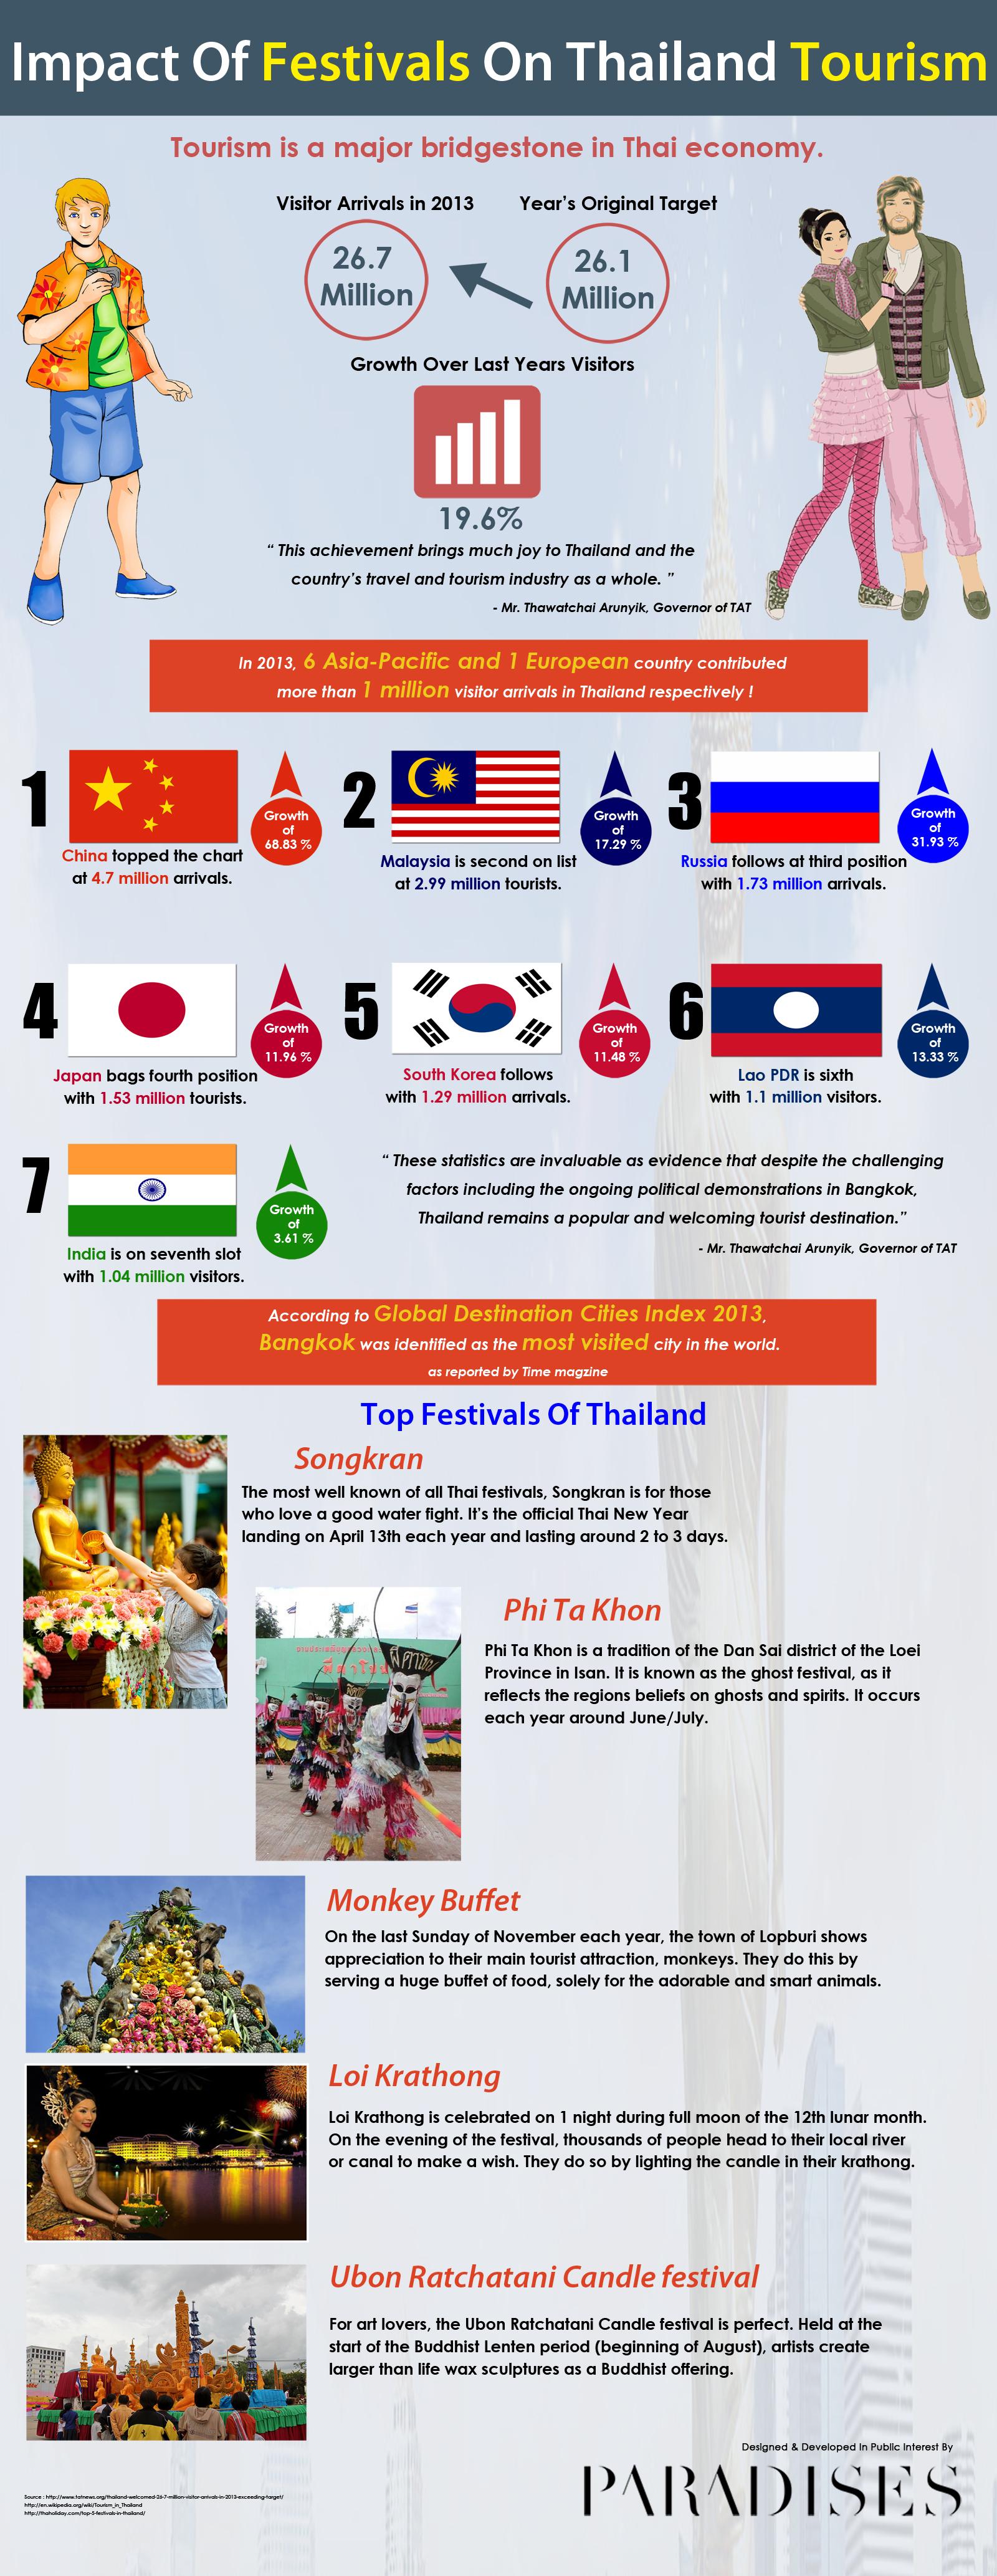 Impact Of Festivals On Thailand Tourism